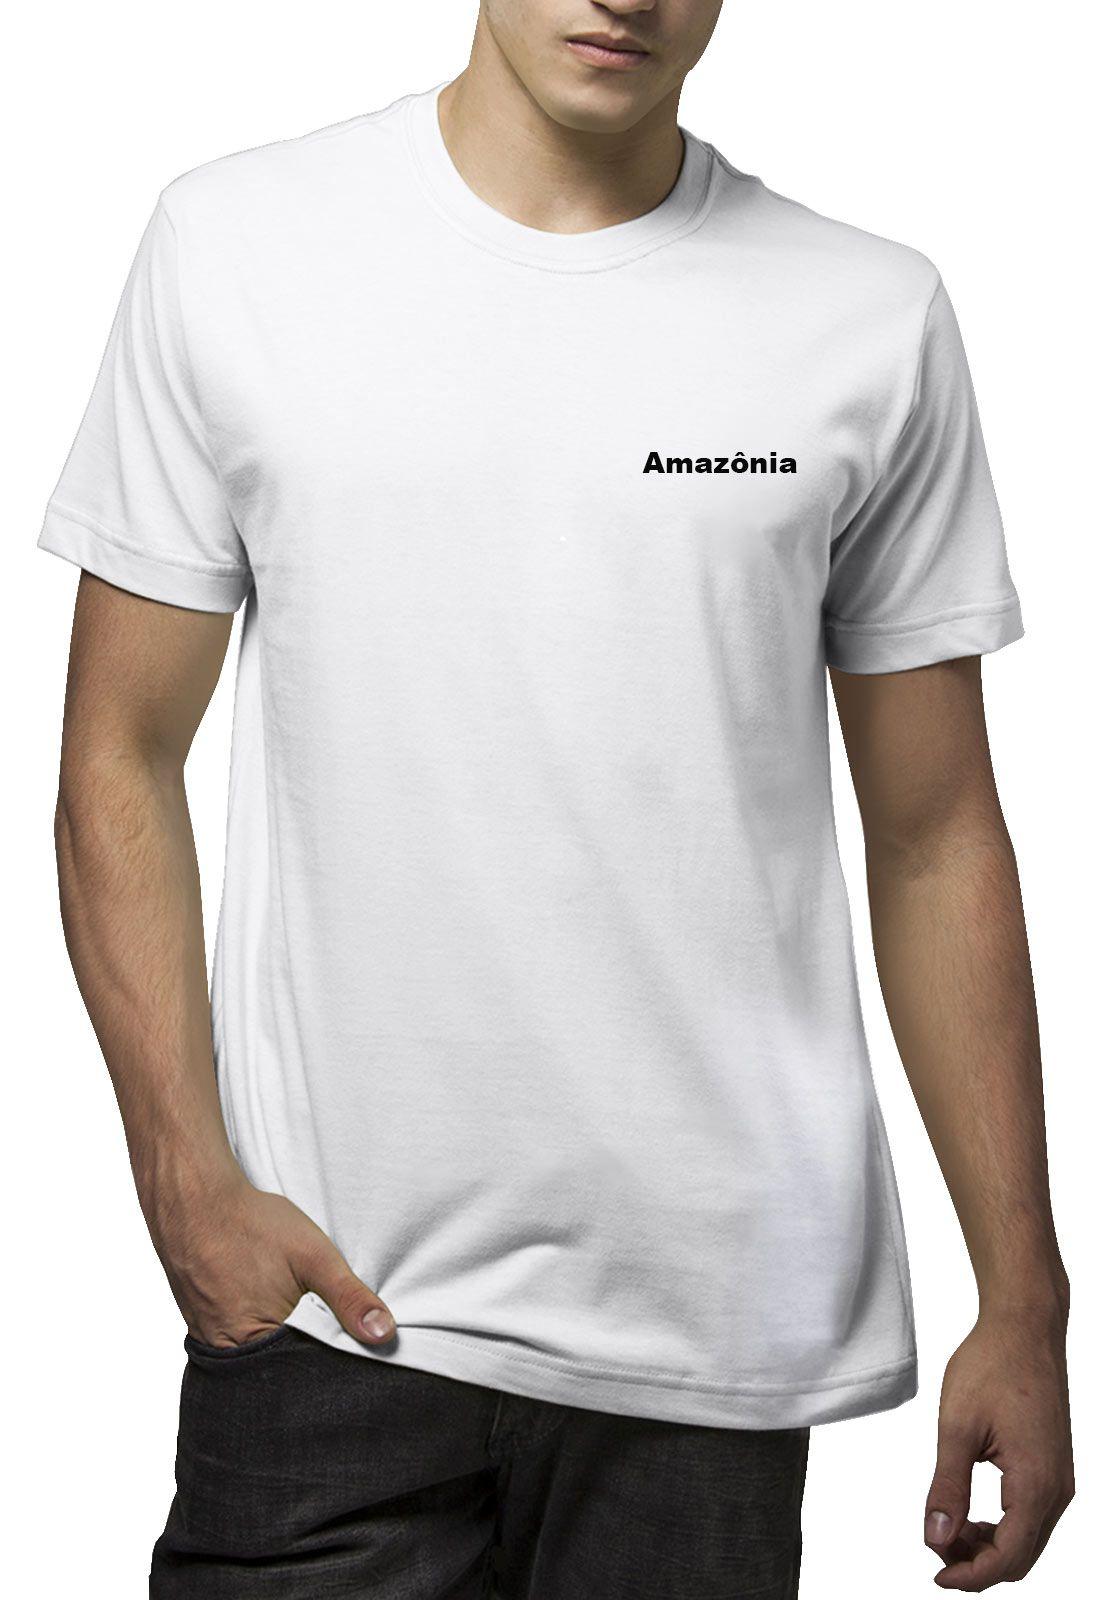 Camiseta Amazônia 3 Folhas - Branco